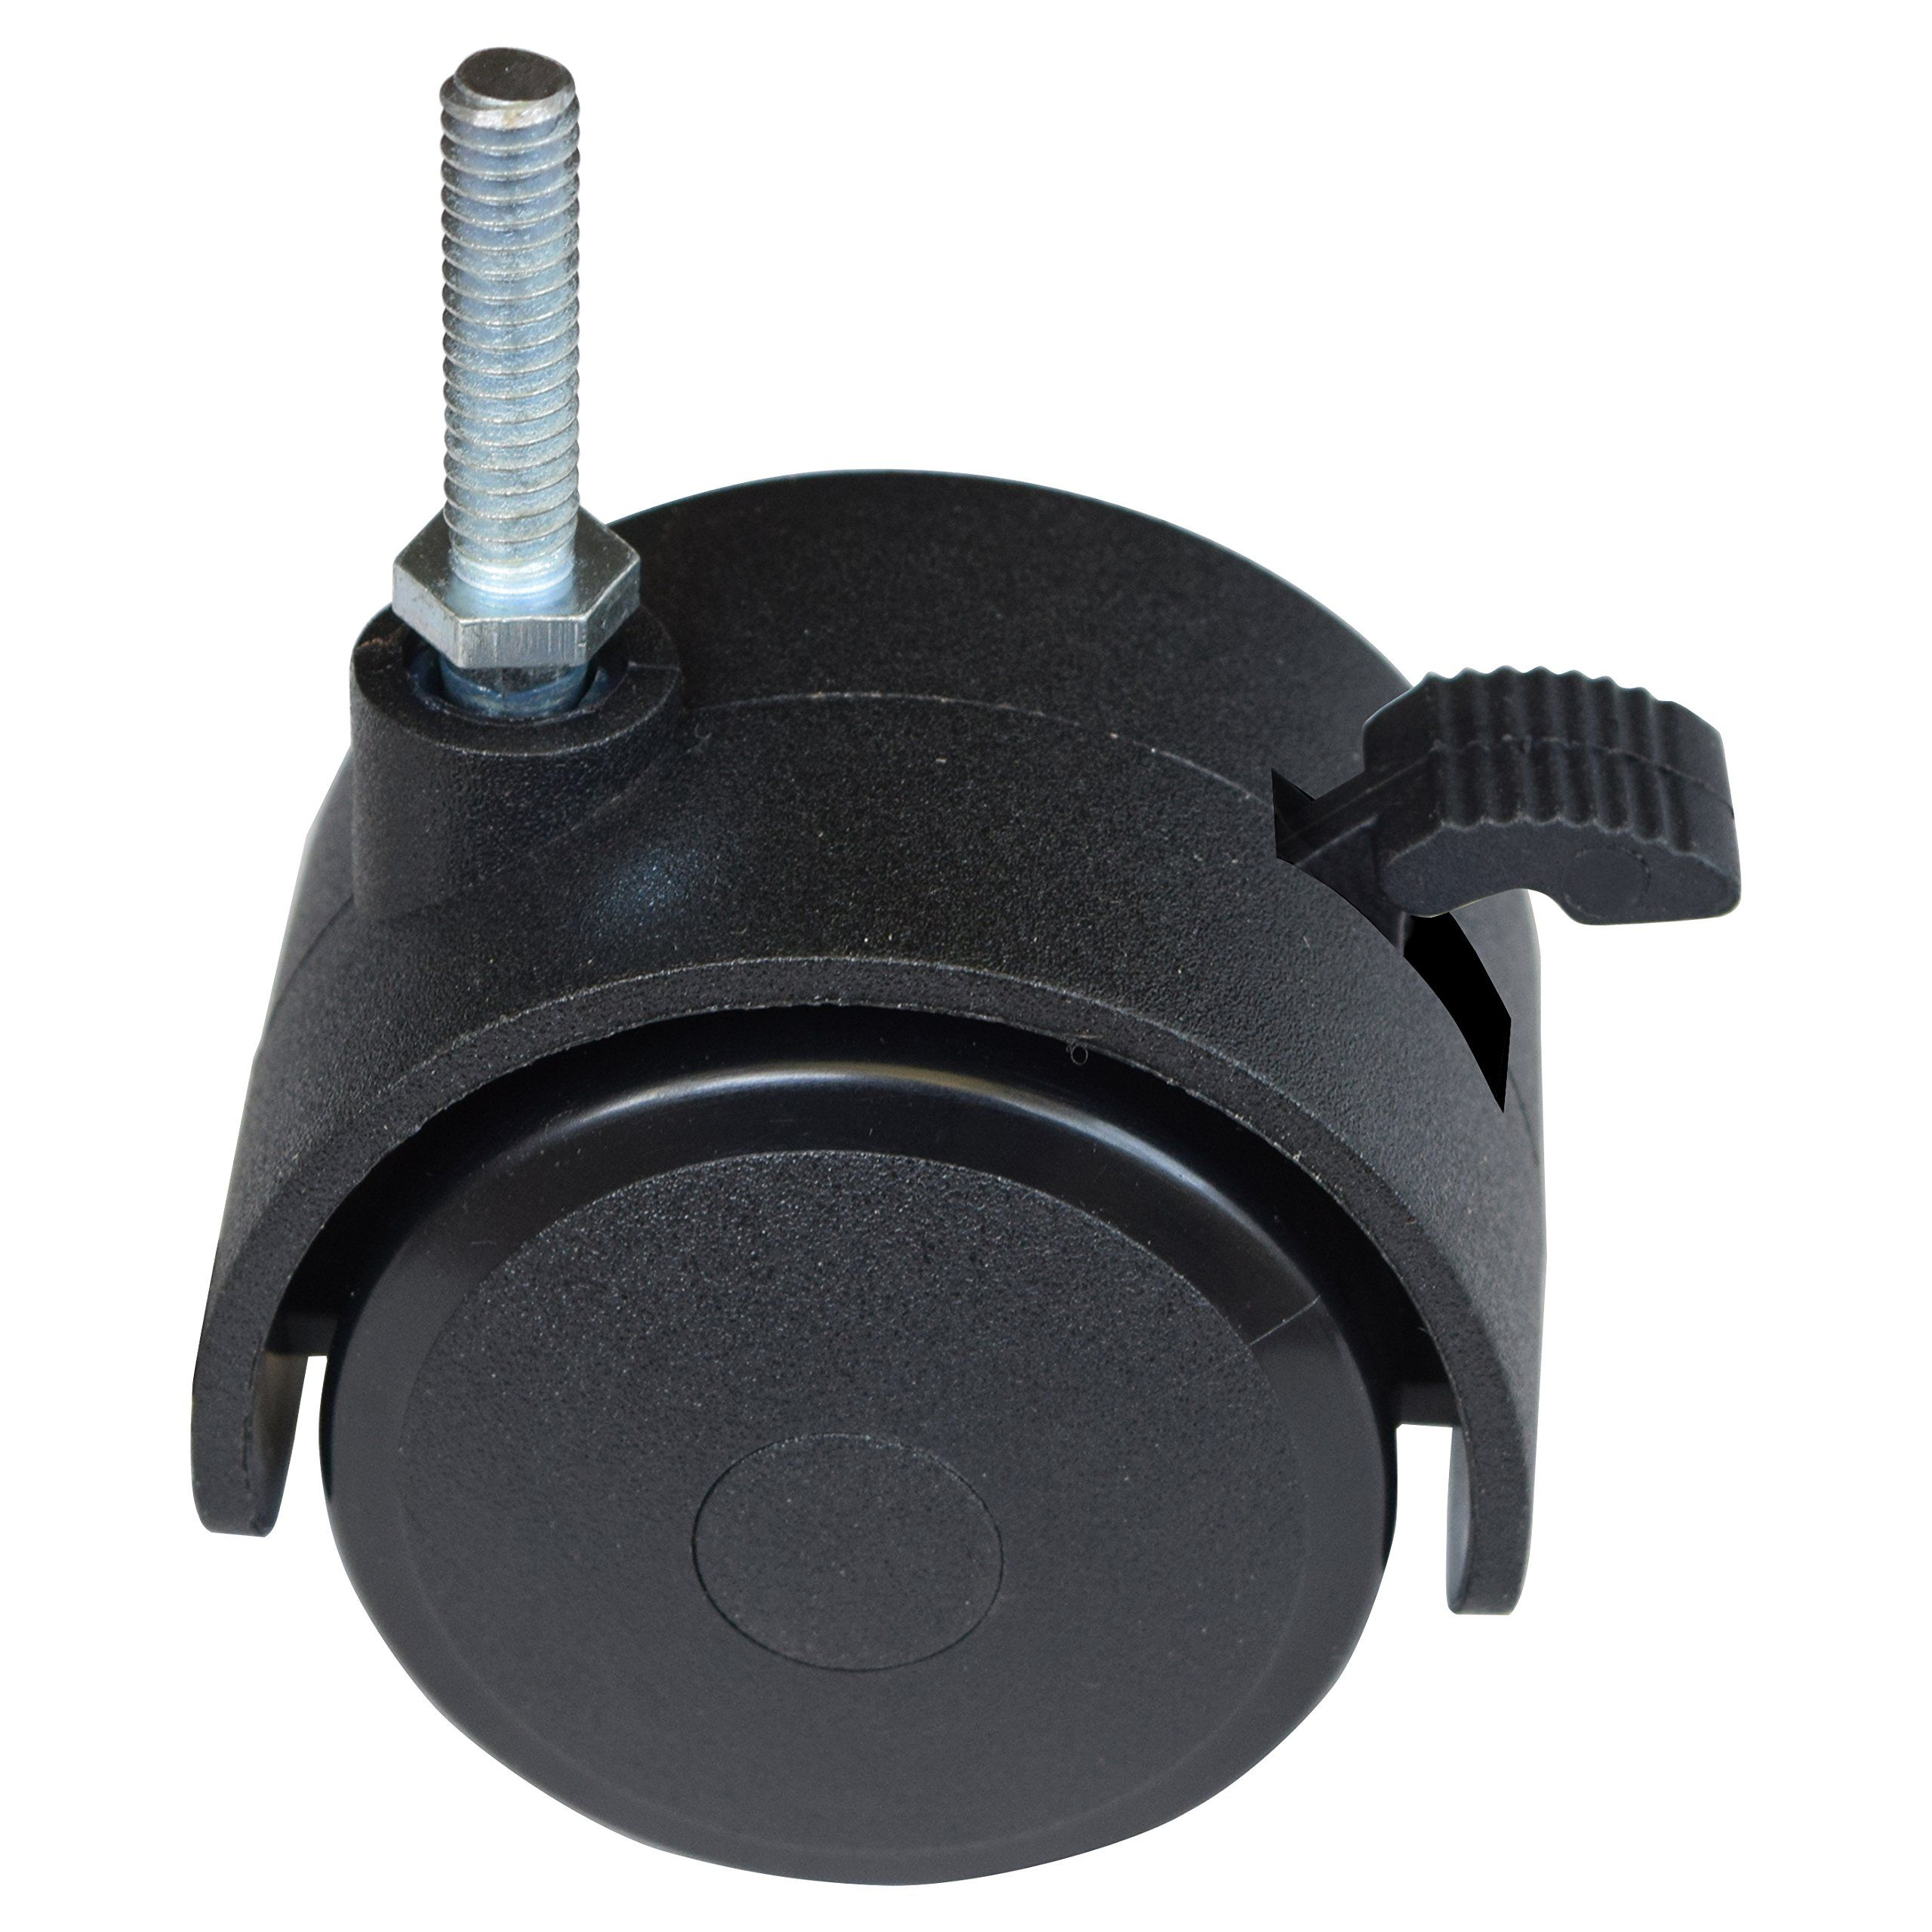 "MySit 2"" Caster Swivel Stem Caster Wheel With Locking Brake 1 4"